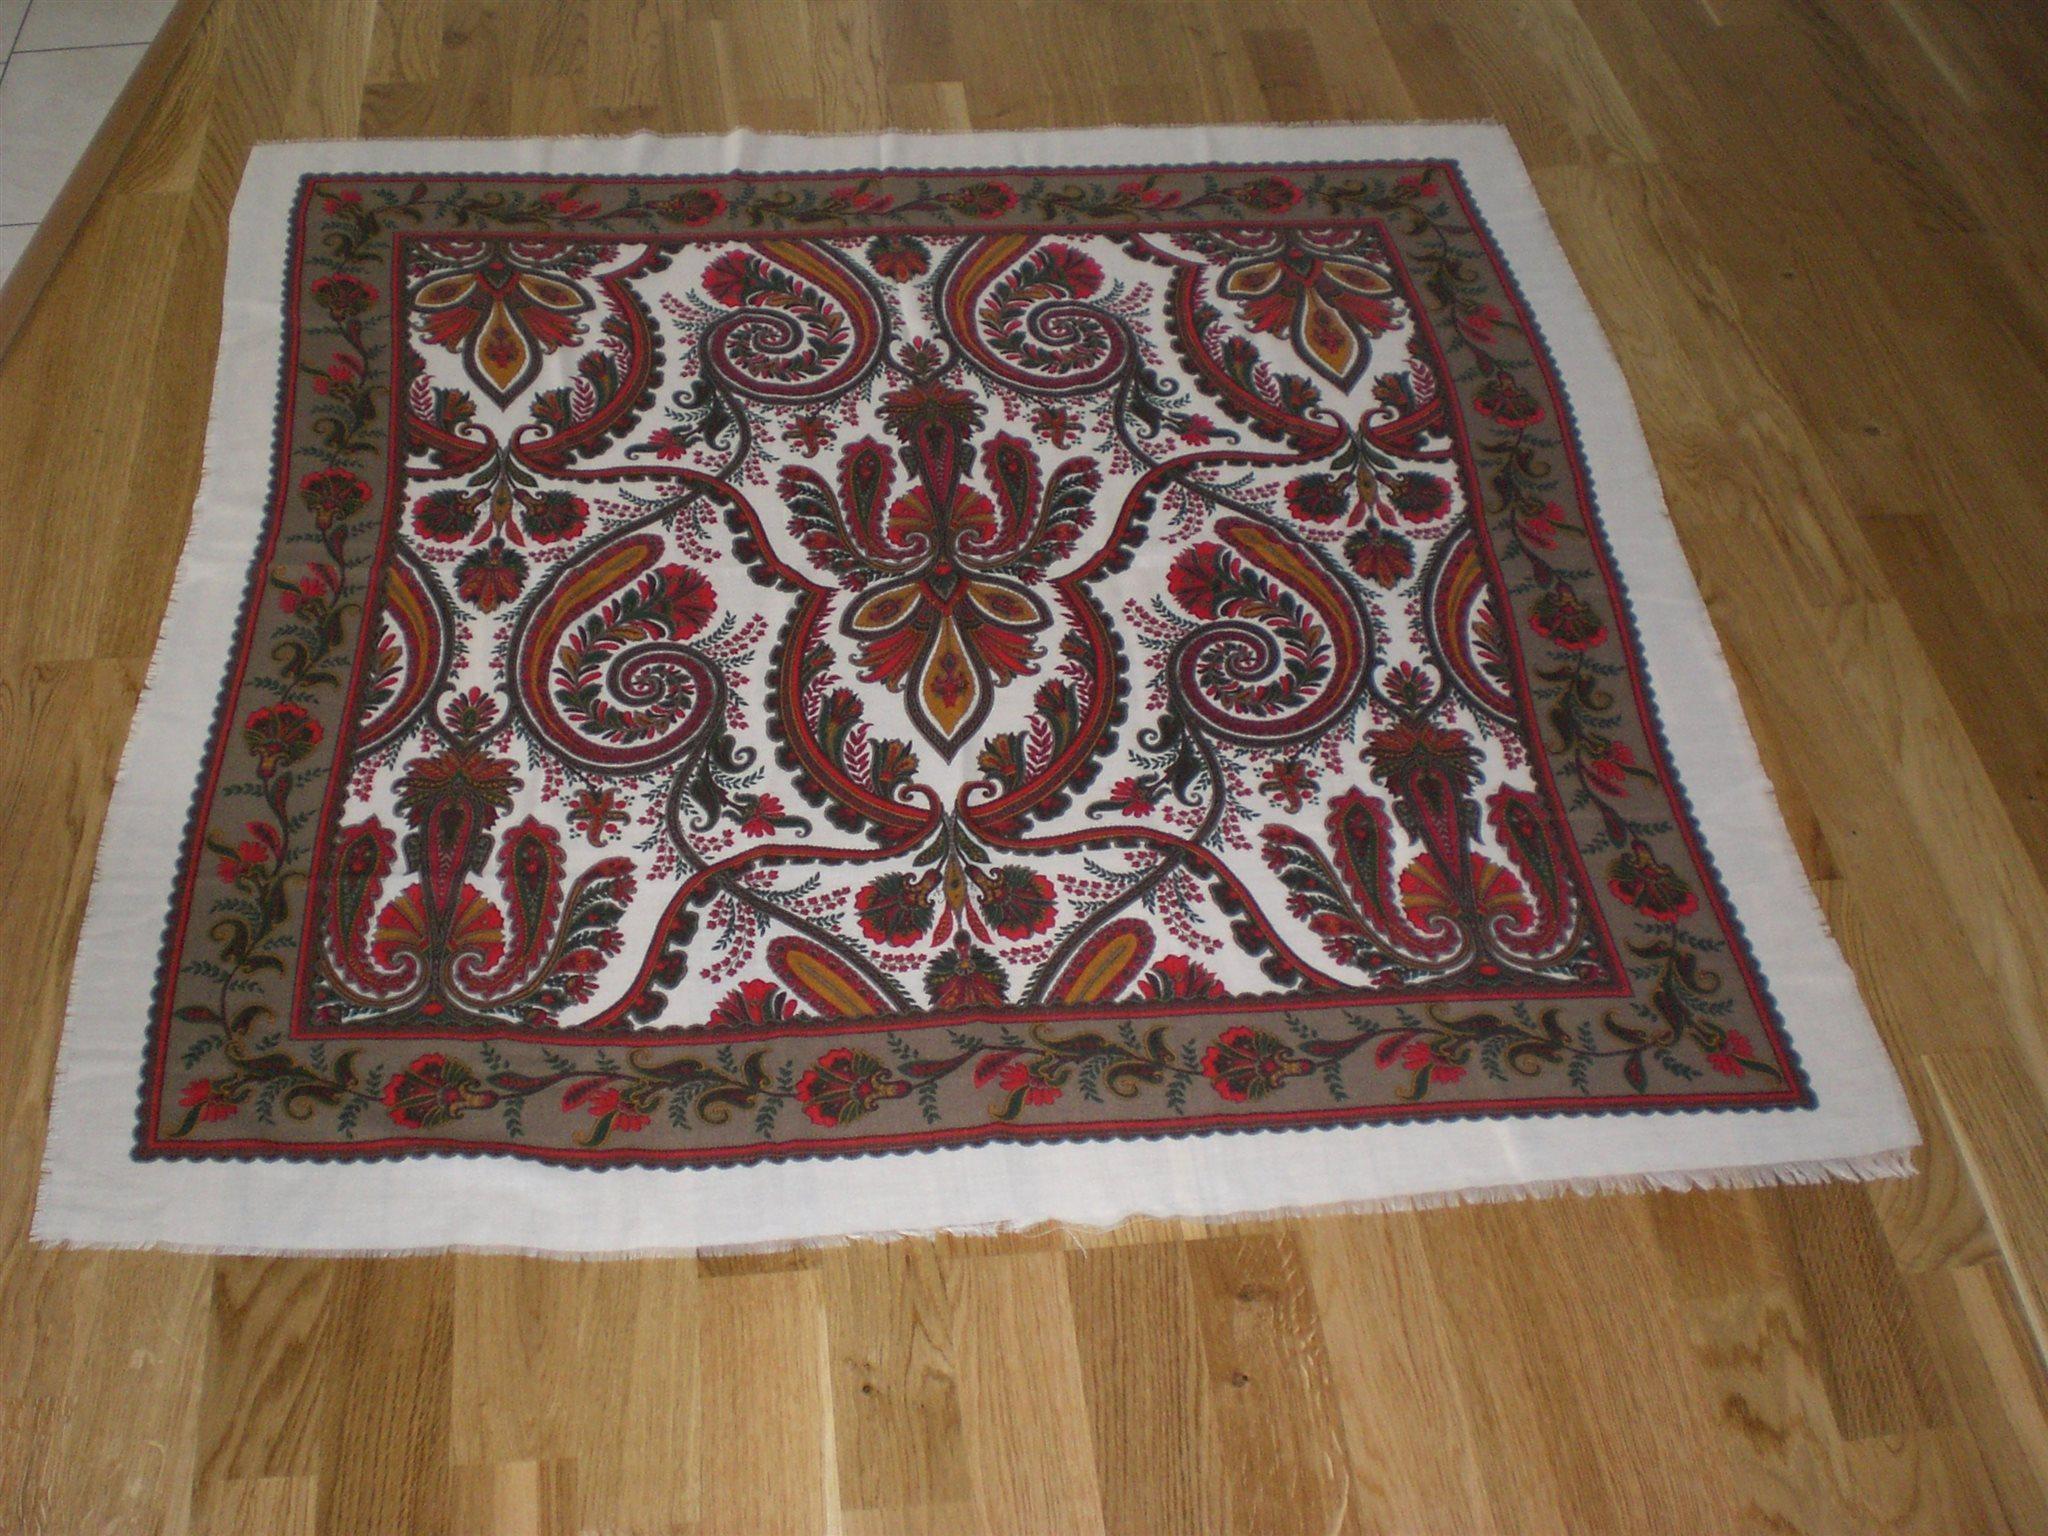 Halsduk stor duk vintage (338239853) ᐈ Köp på Tradera c8f03e0857541